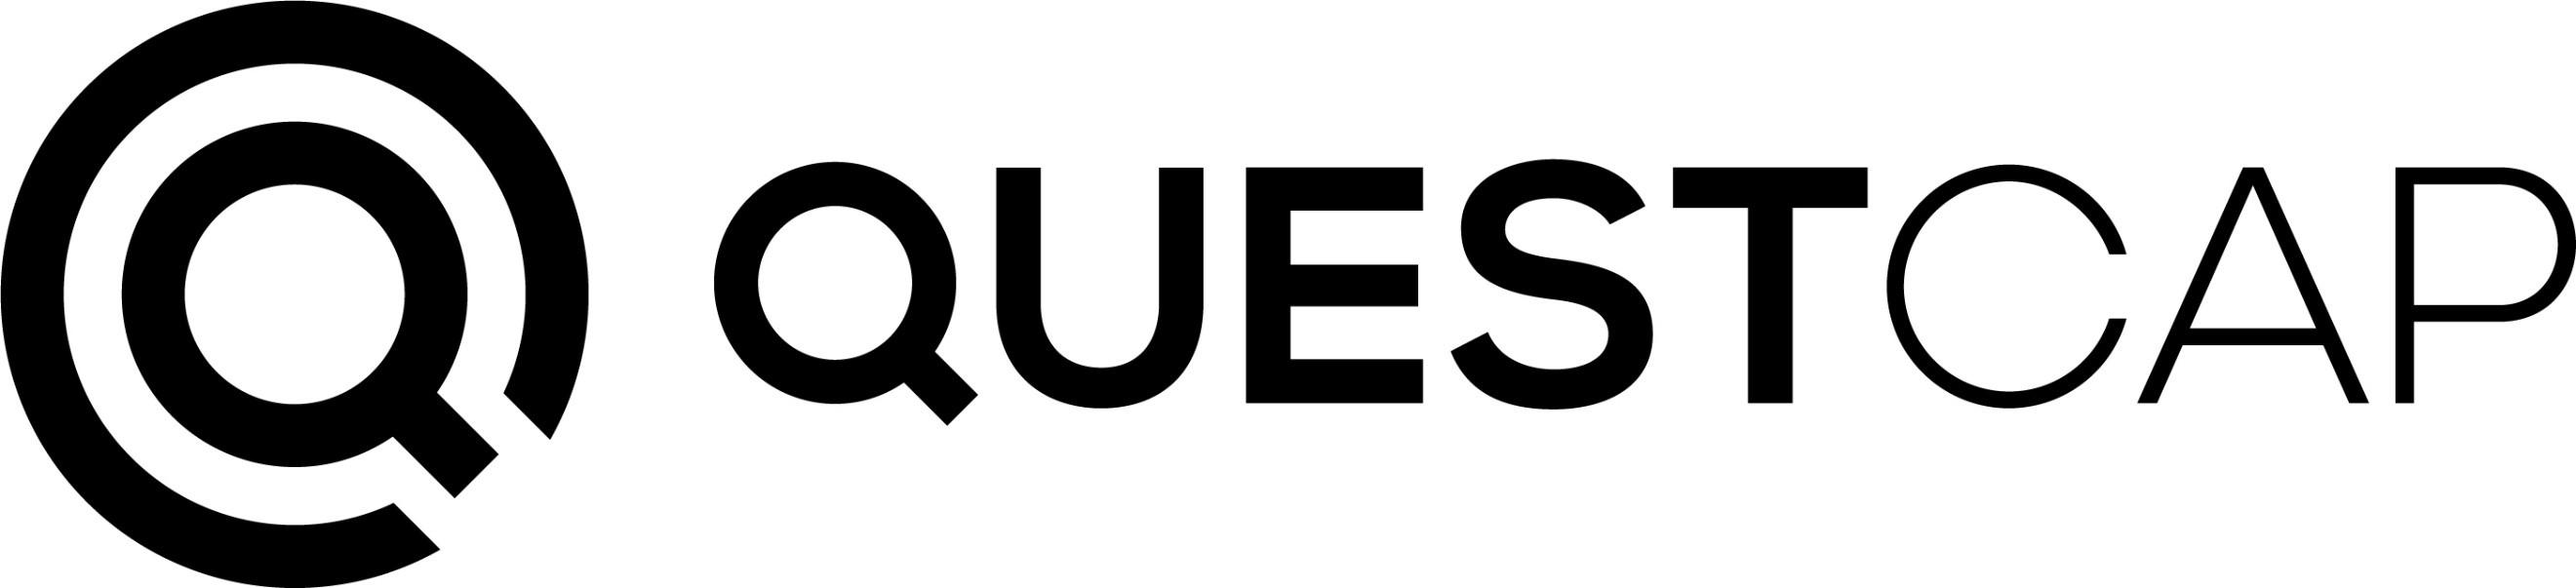 QuestCap Announces Letter of Intent to Acquire 100% of Las Vegas based Collection Sites, LLC